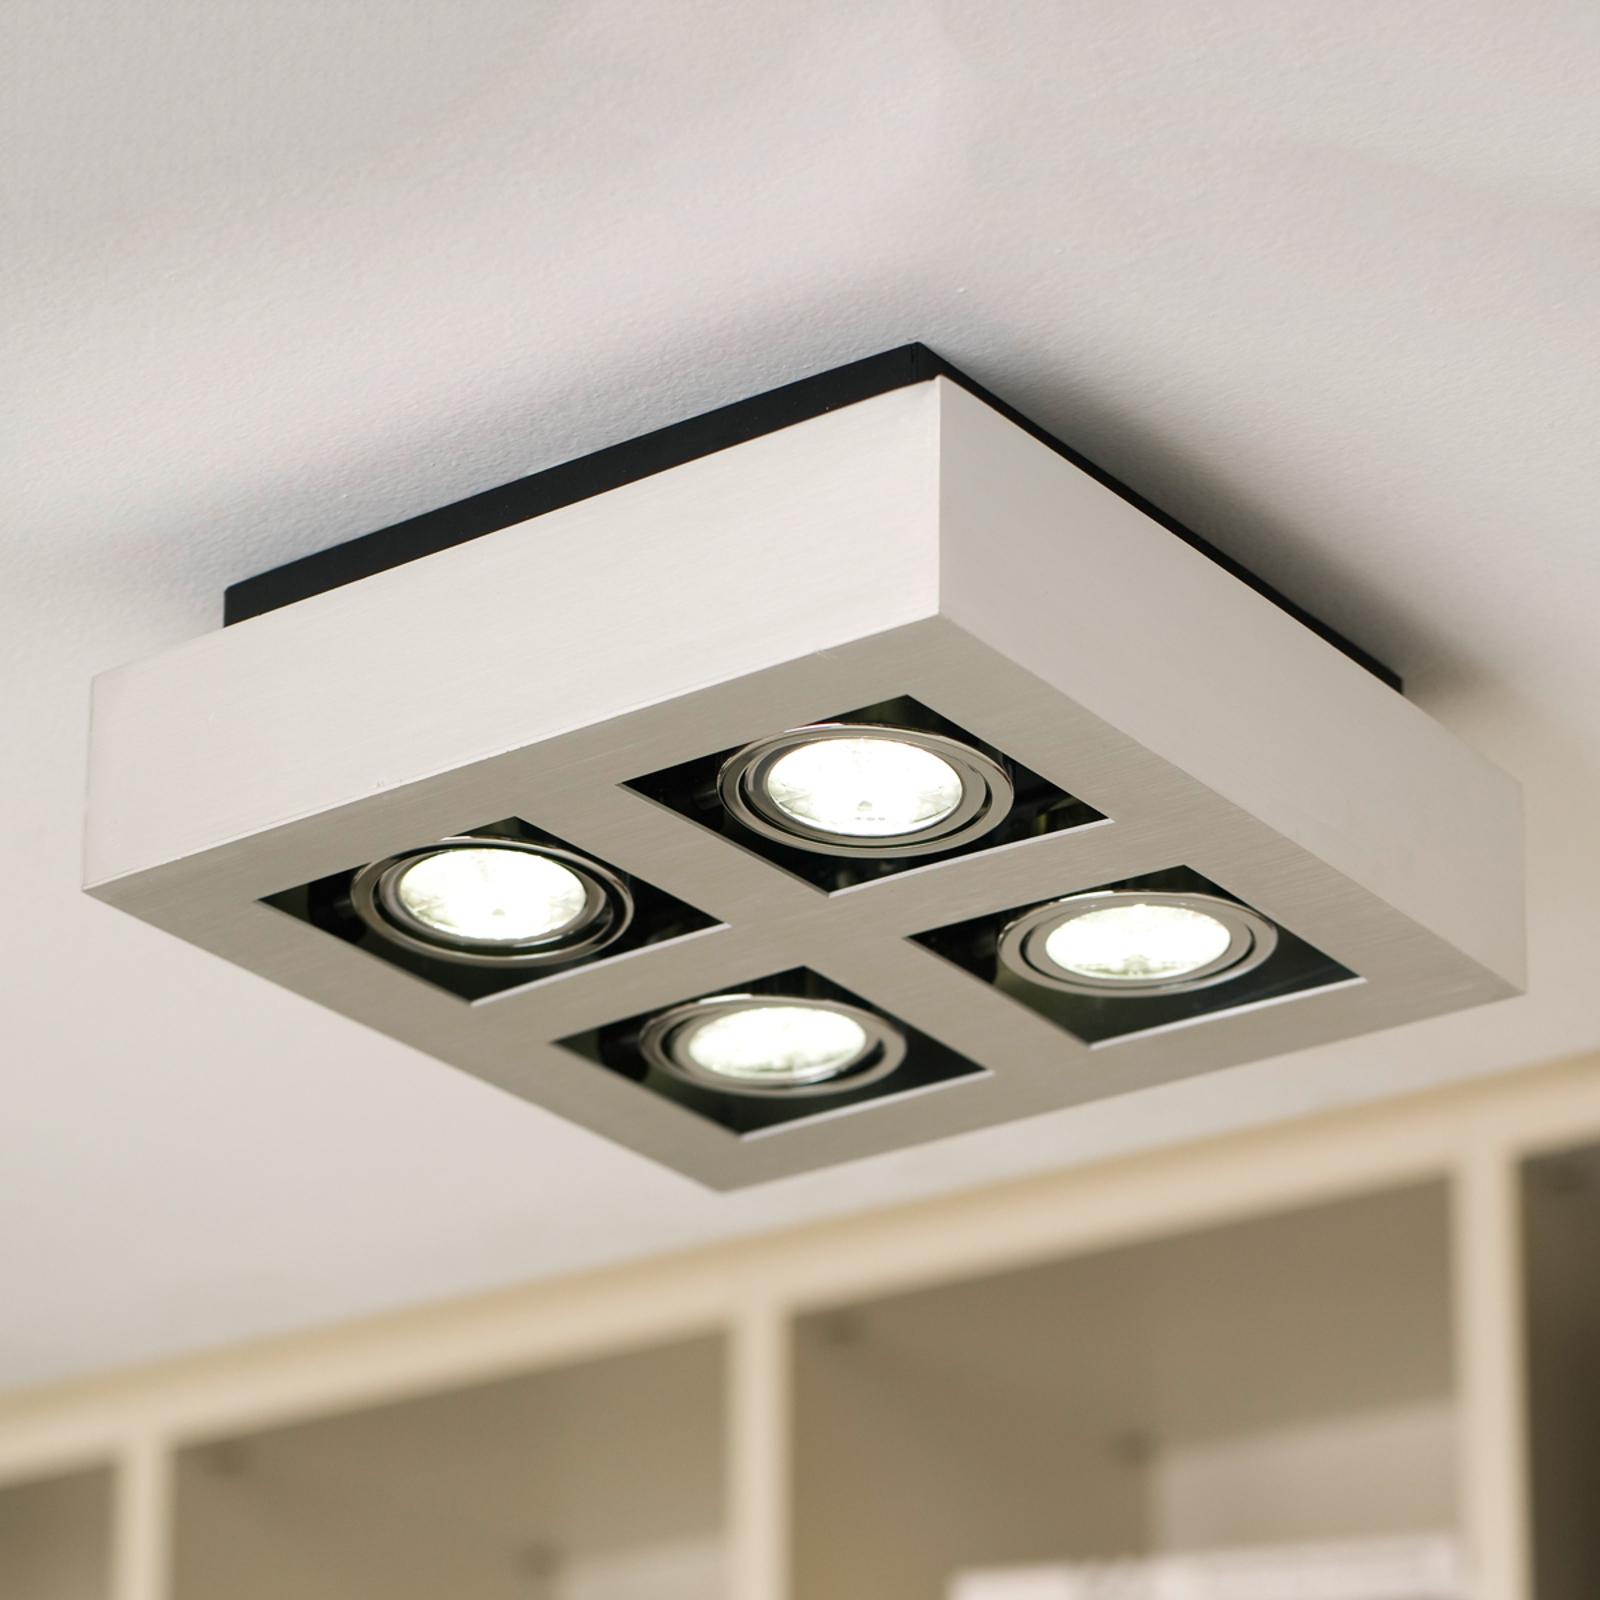 Vierflammige LED-Deckenleuchte Loke